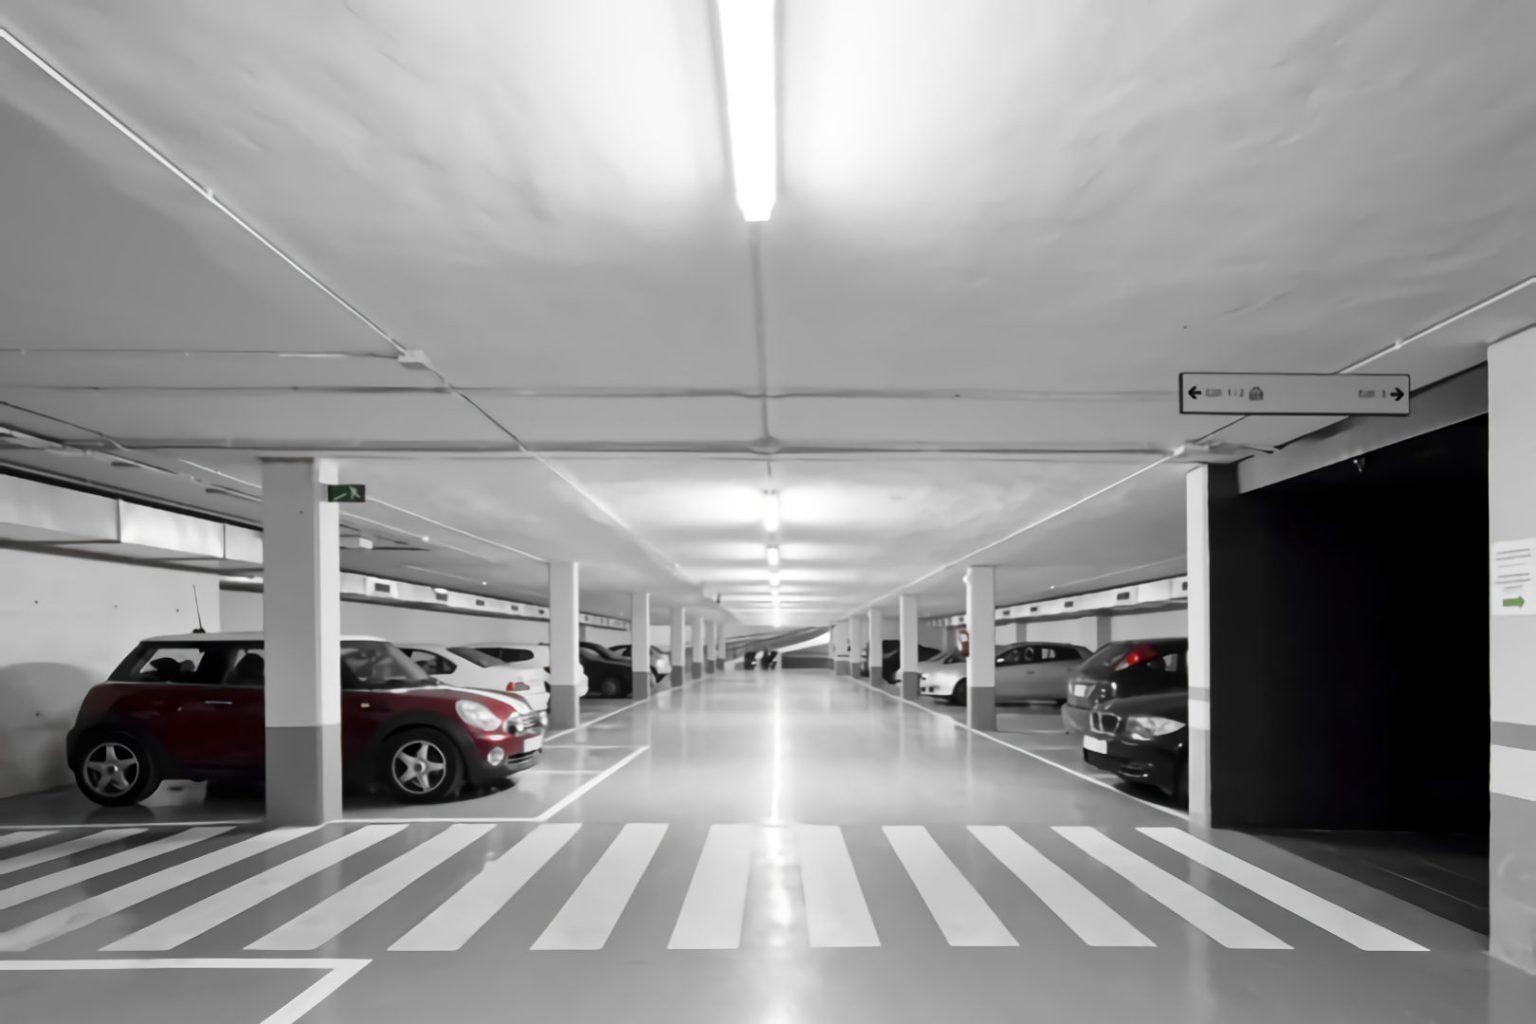 micron-group-carpark-lighting-replacement-with sensor-led-lights